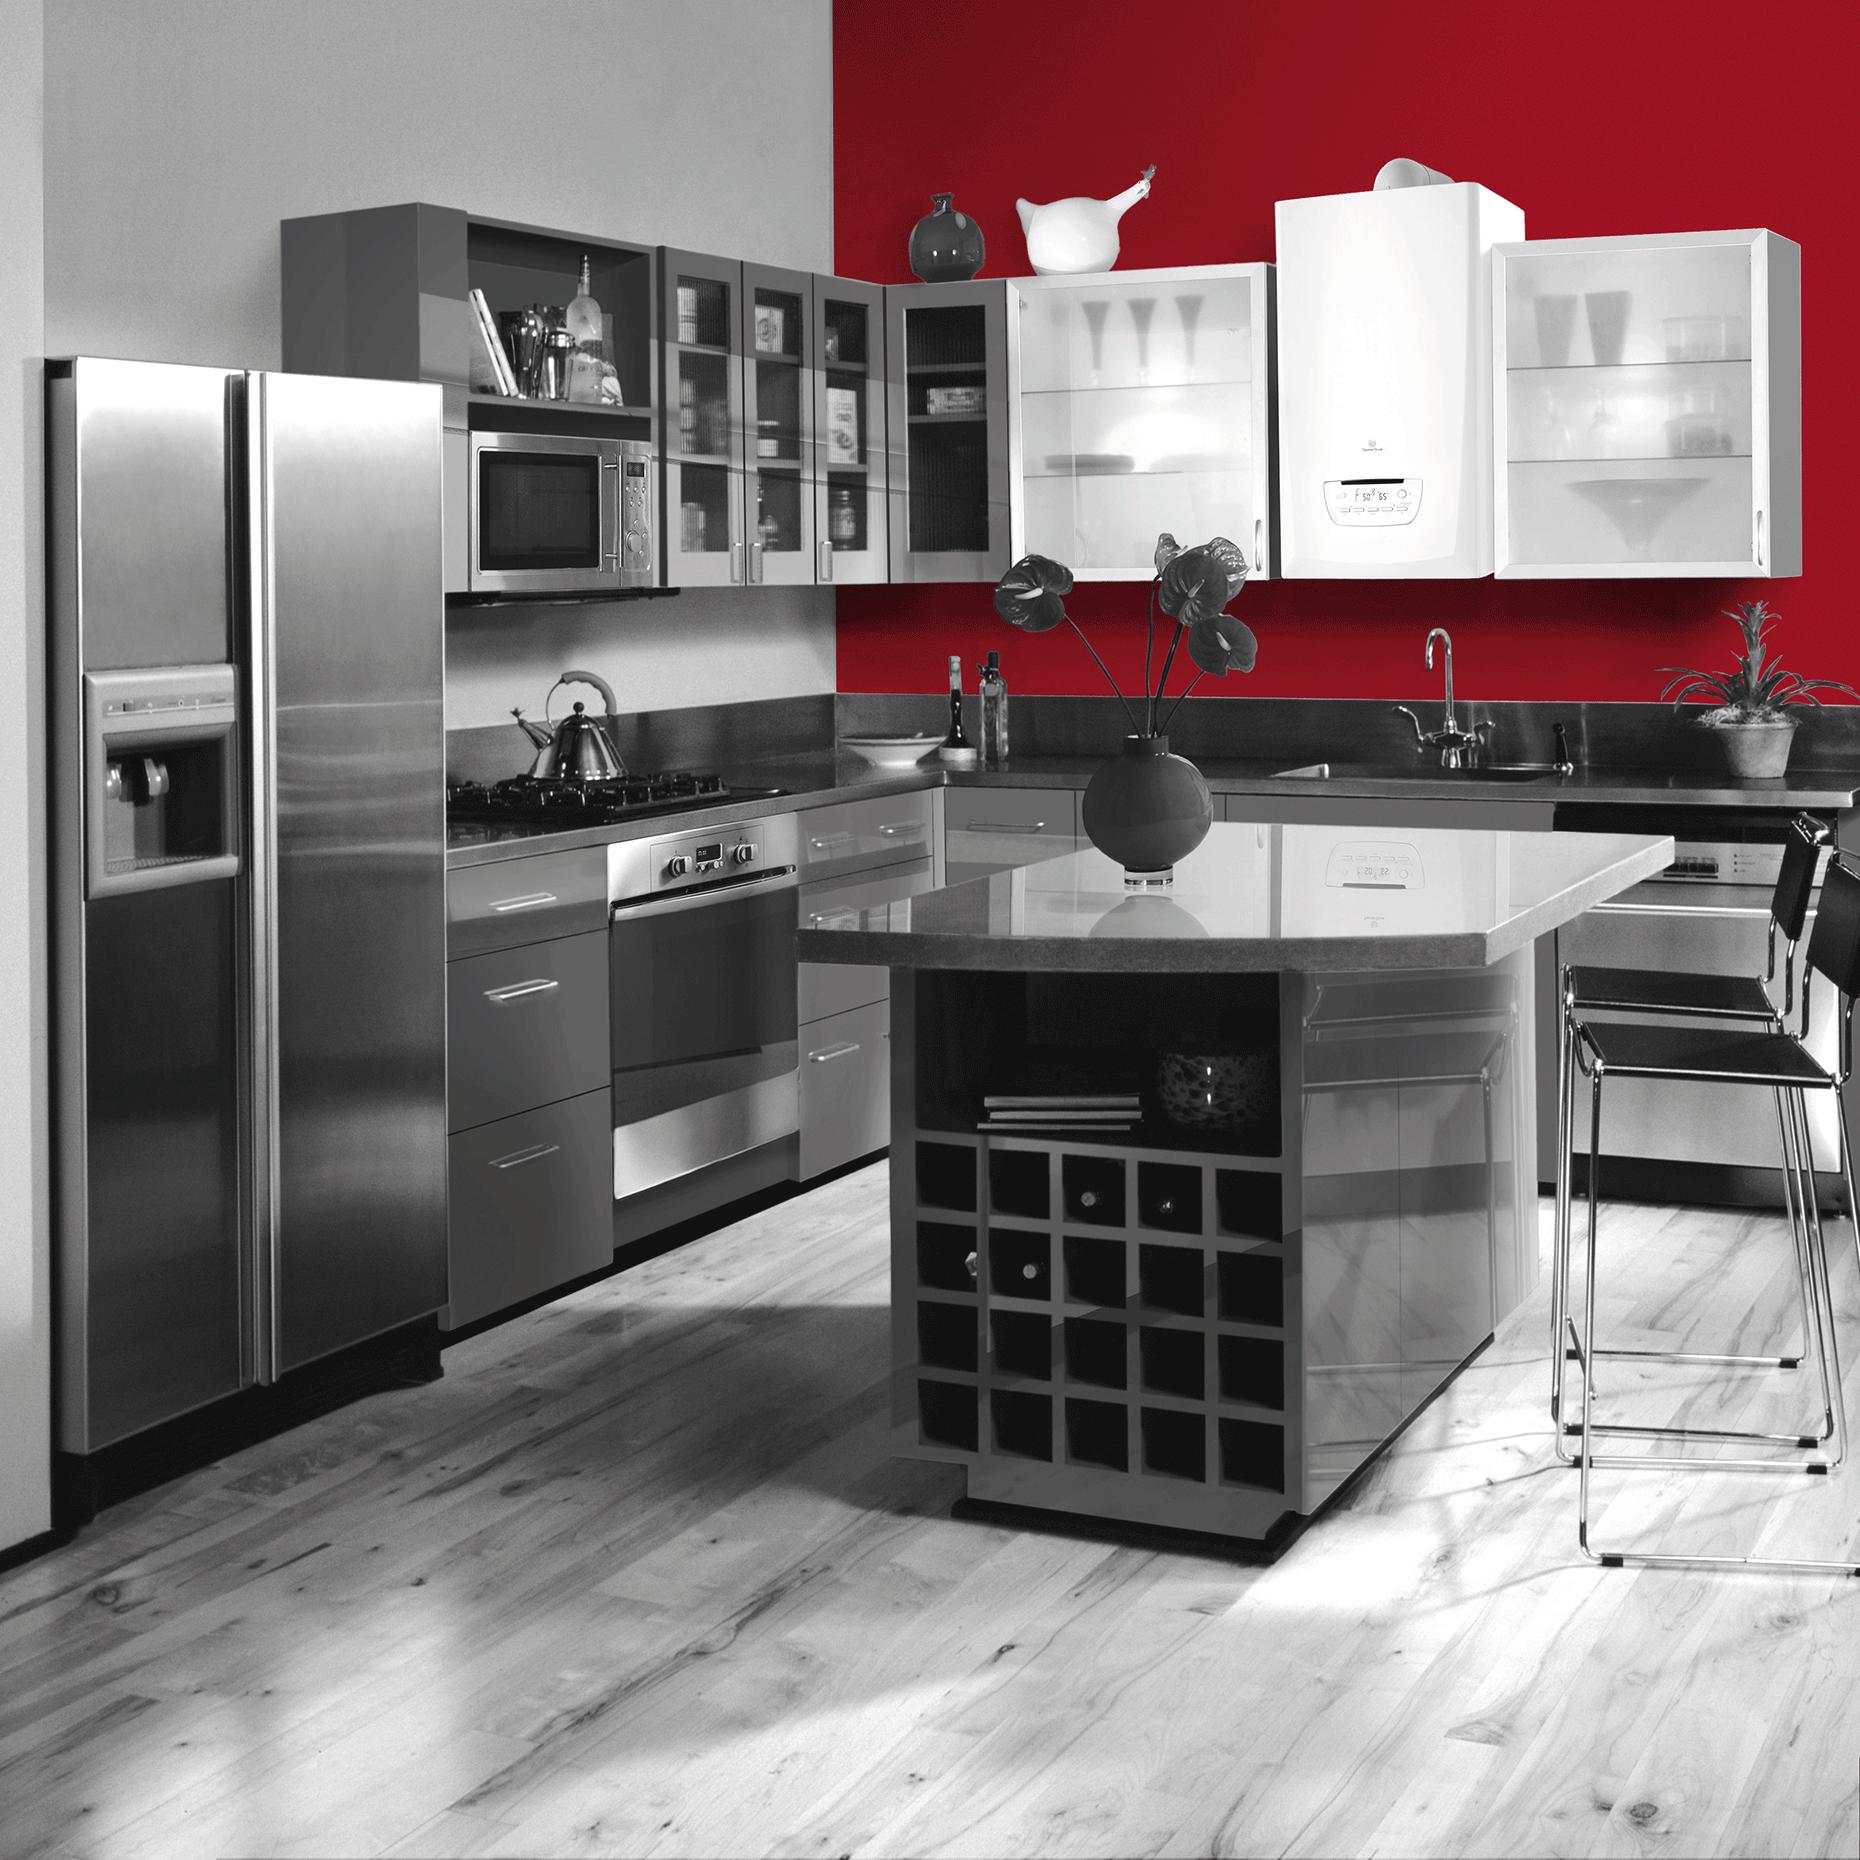 themaplus condens chaudieres gaz condensation pros. Black Bedroom Furniture Sets. Home Design Ideas